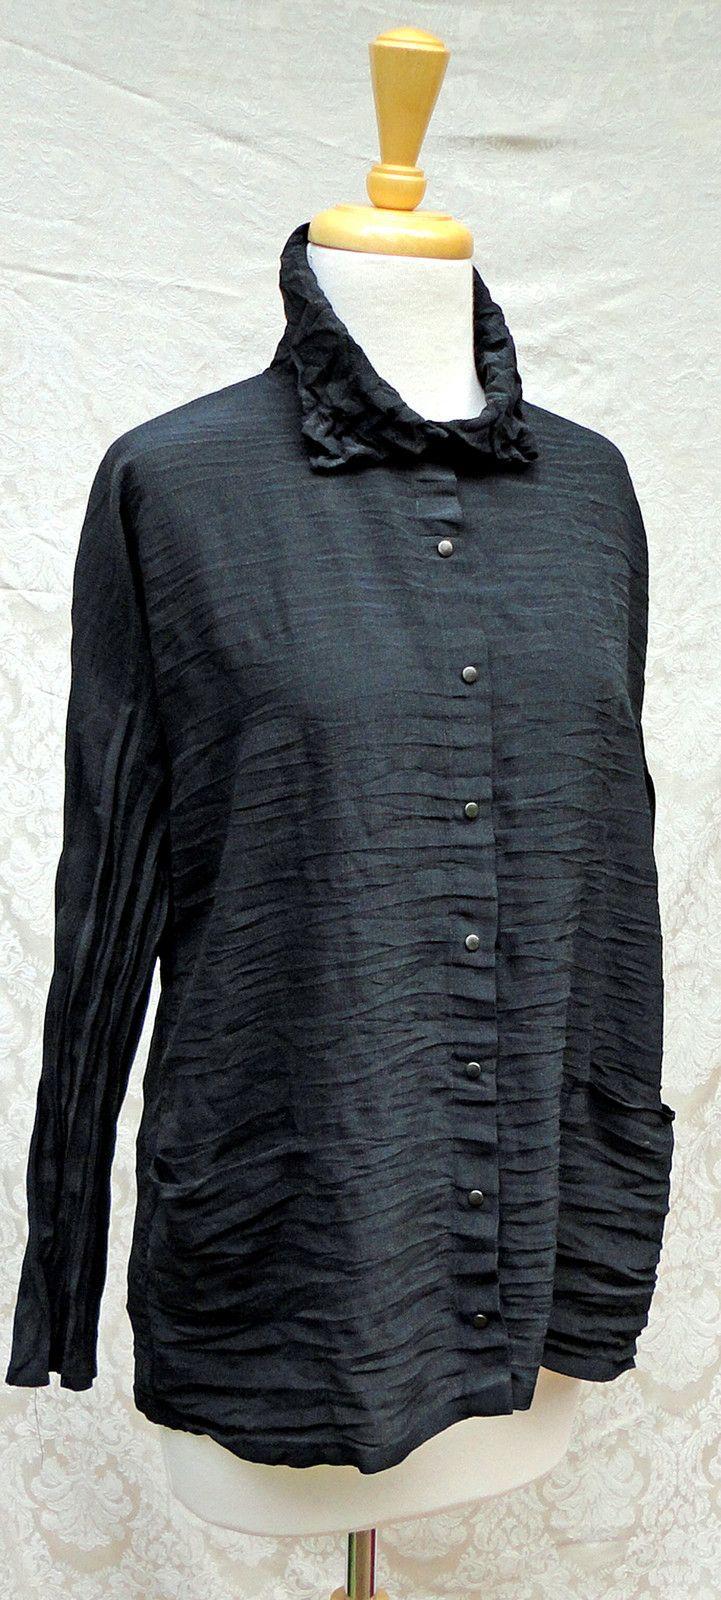 Babette Sf Black Horizontal Pleats Snap Front Wrinkled Collar Shirt